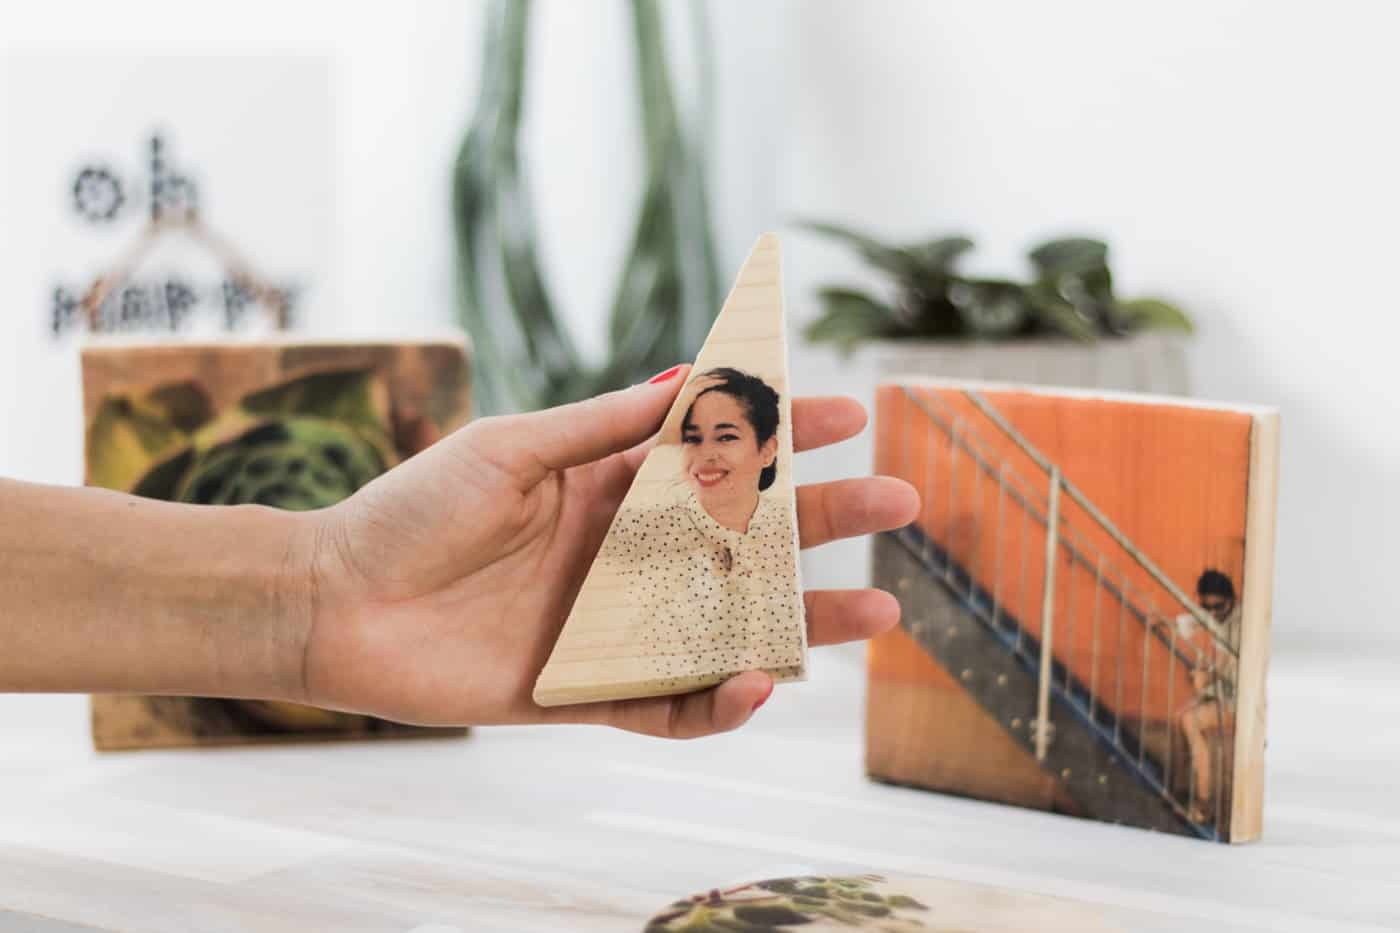 Fotopotch Foto Transfer auf Holz Papier